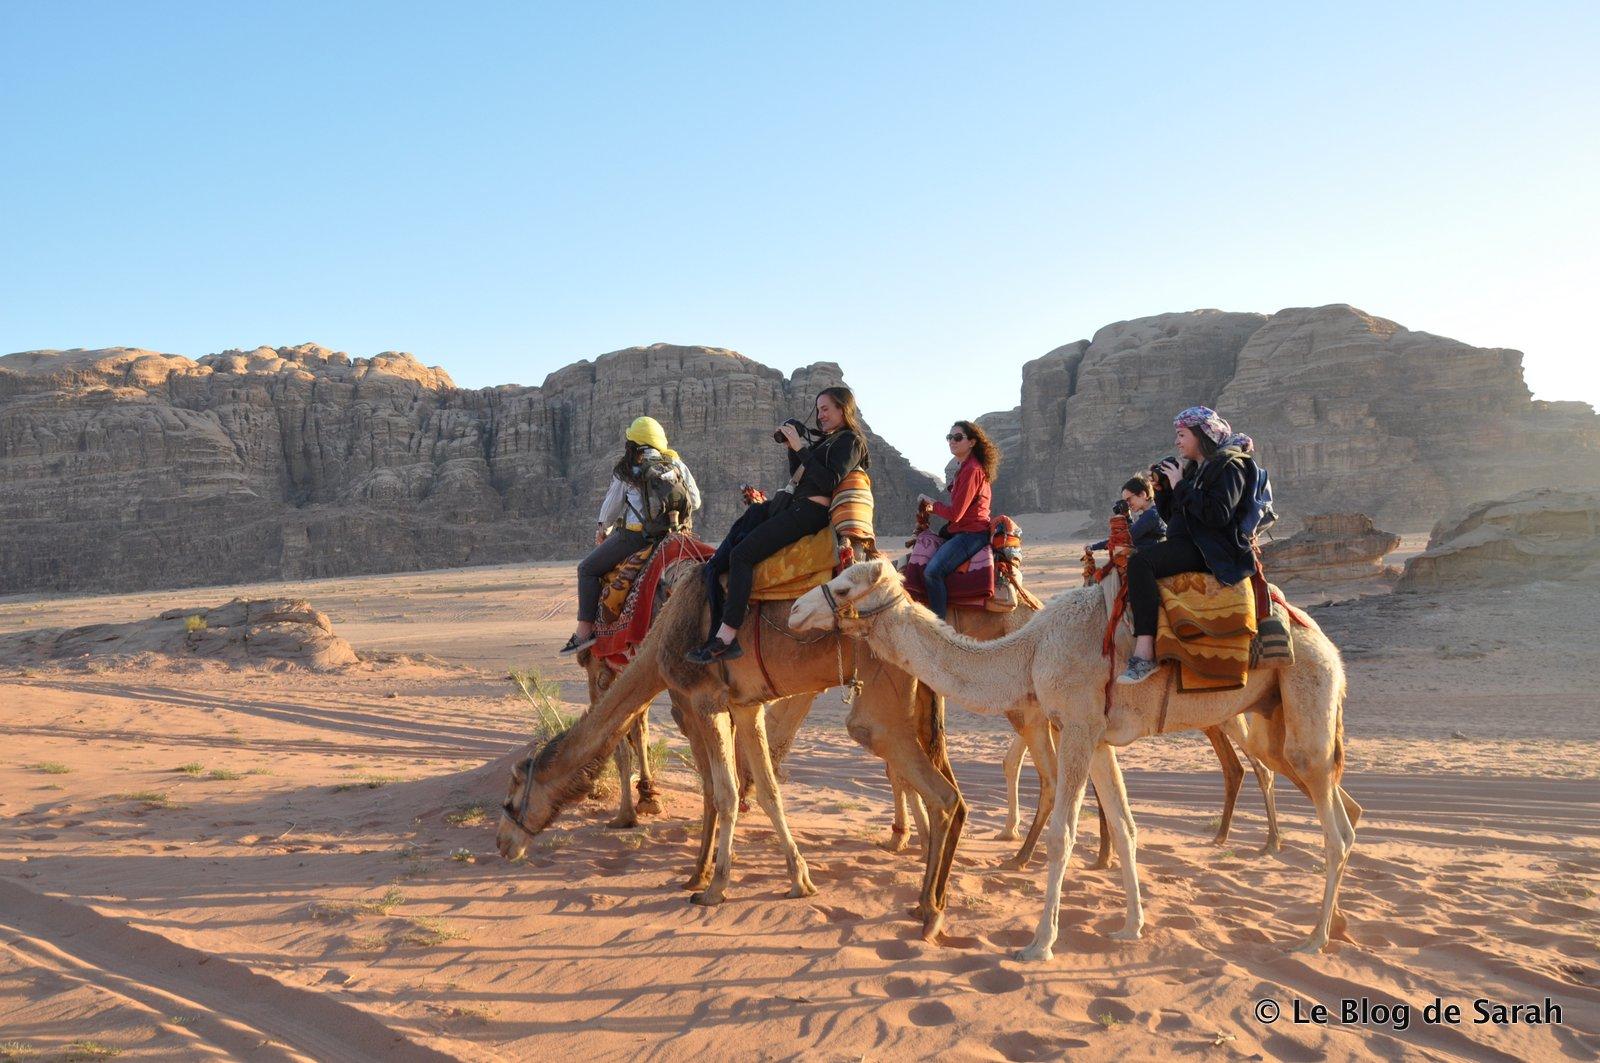 jordanie desert dromadaire wadi rum